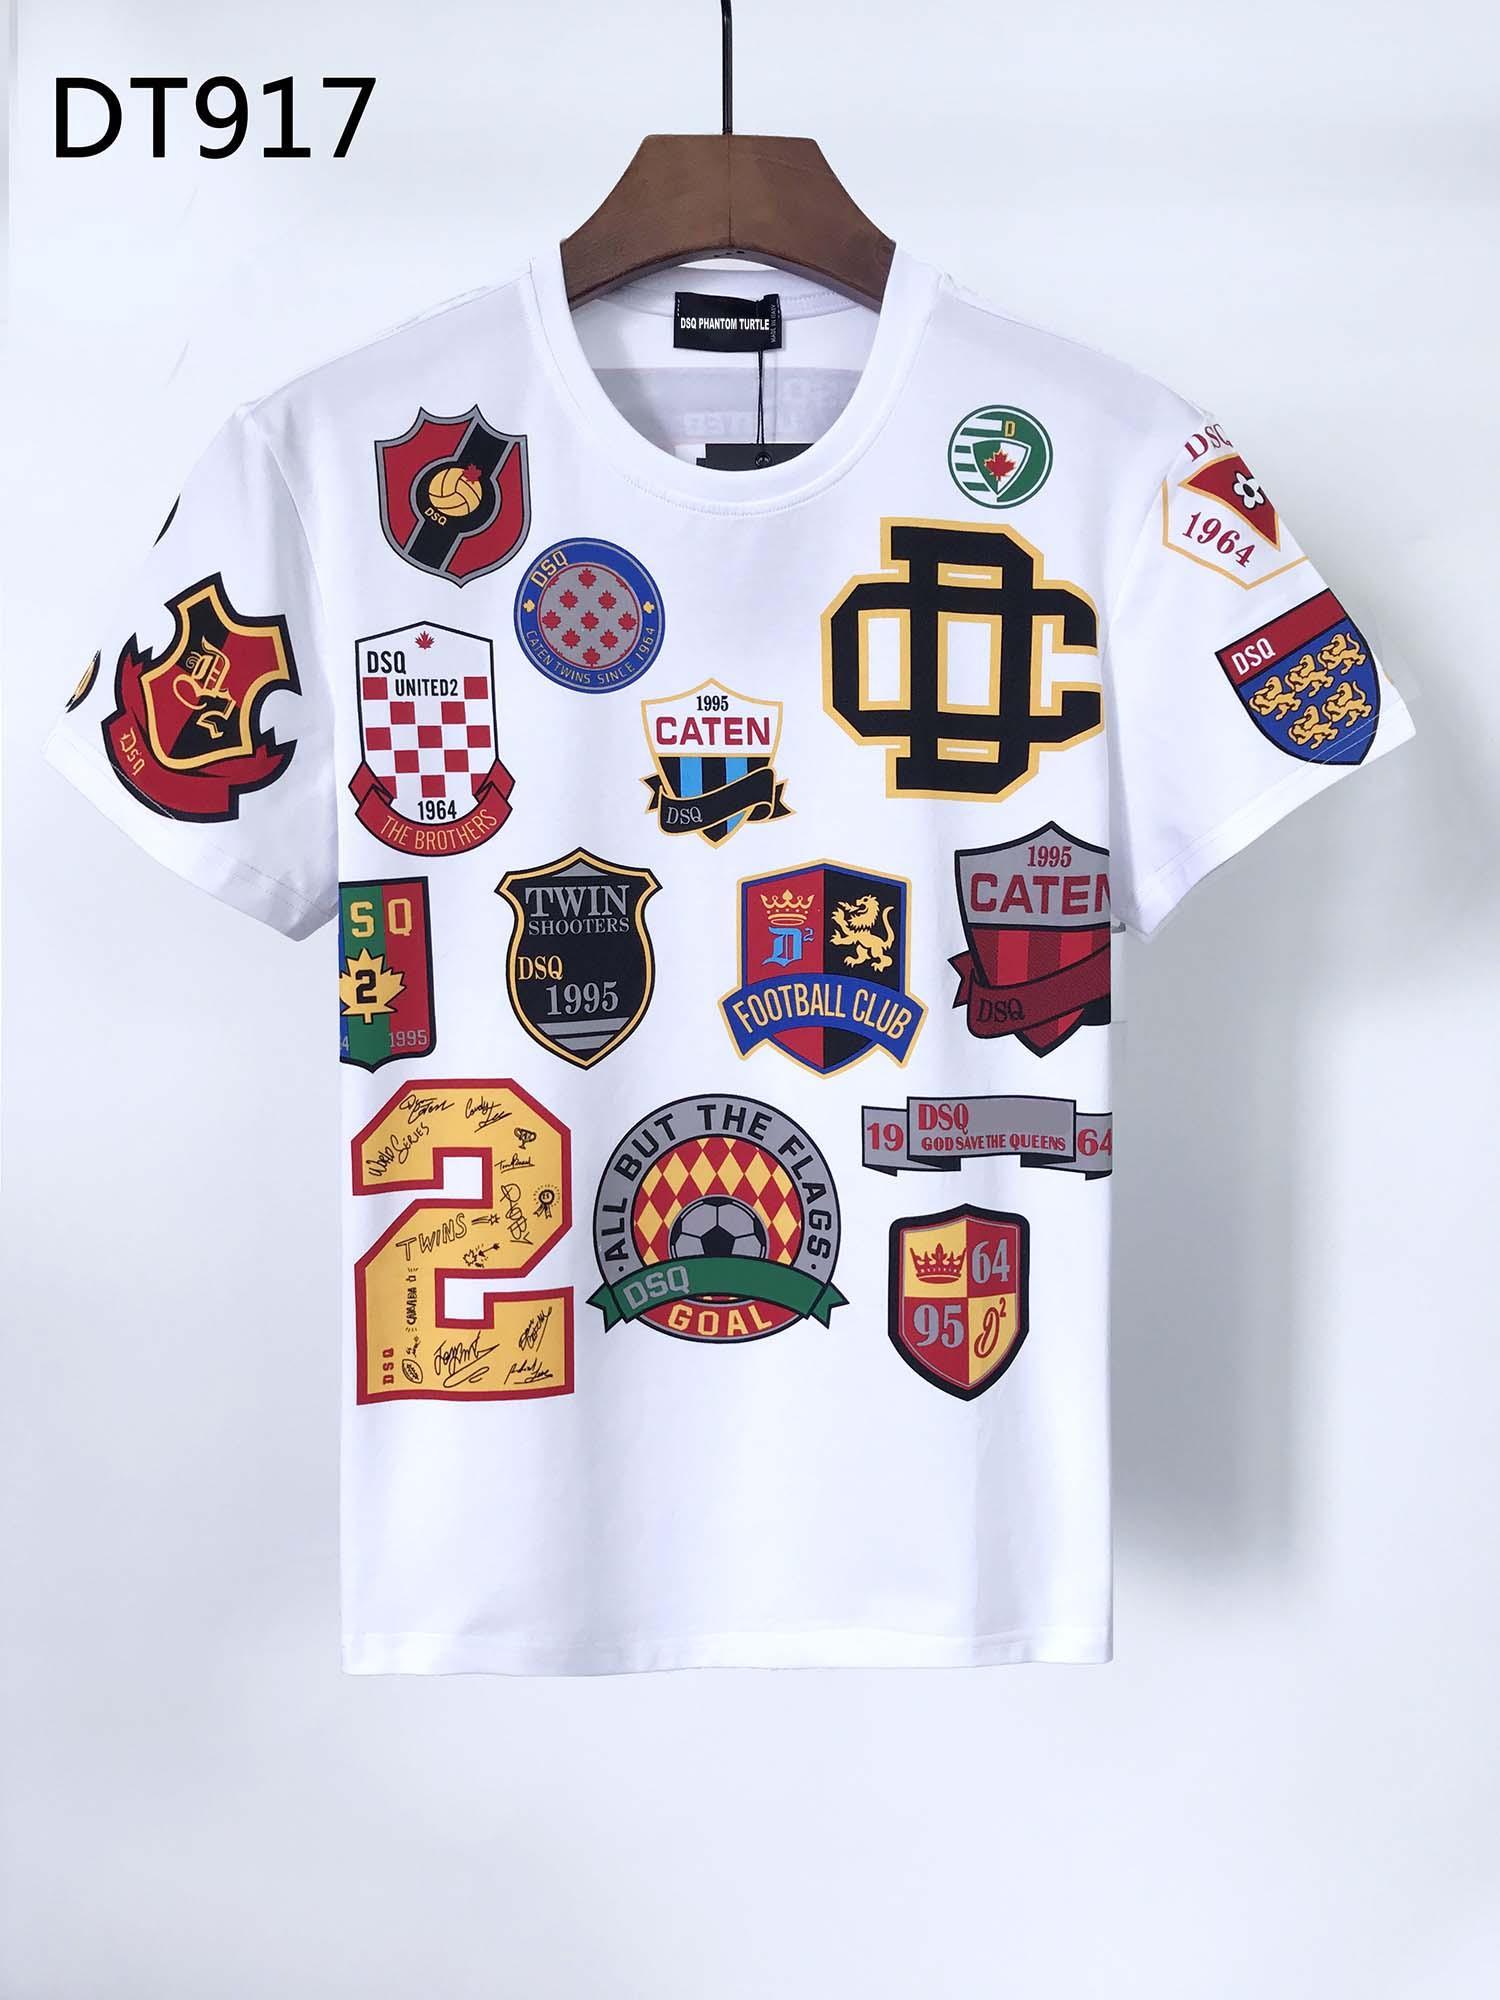 DSQ Mens Designer T Shirts Black White Men Summer Fashion Casual Street T-shirt Tops Short Sleeve Euro Size M-XXXL 6853